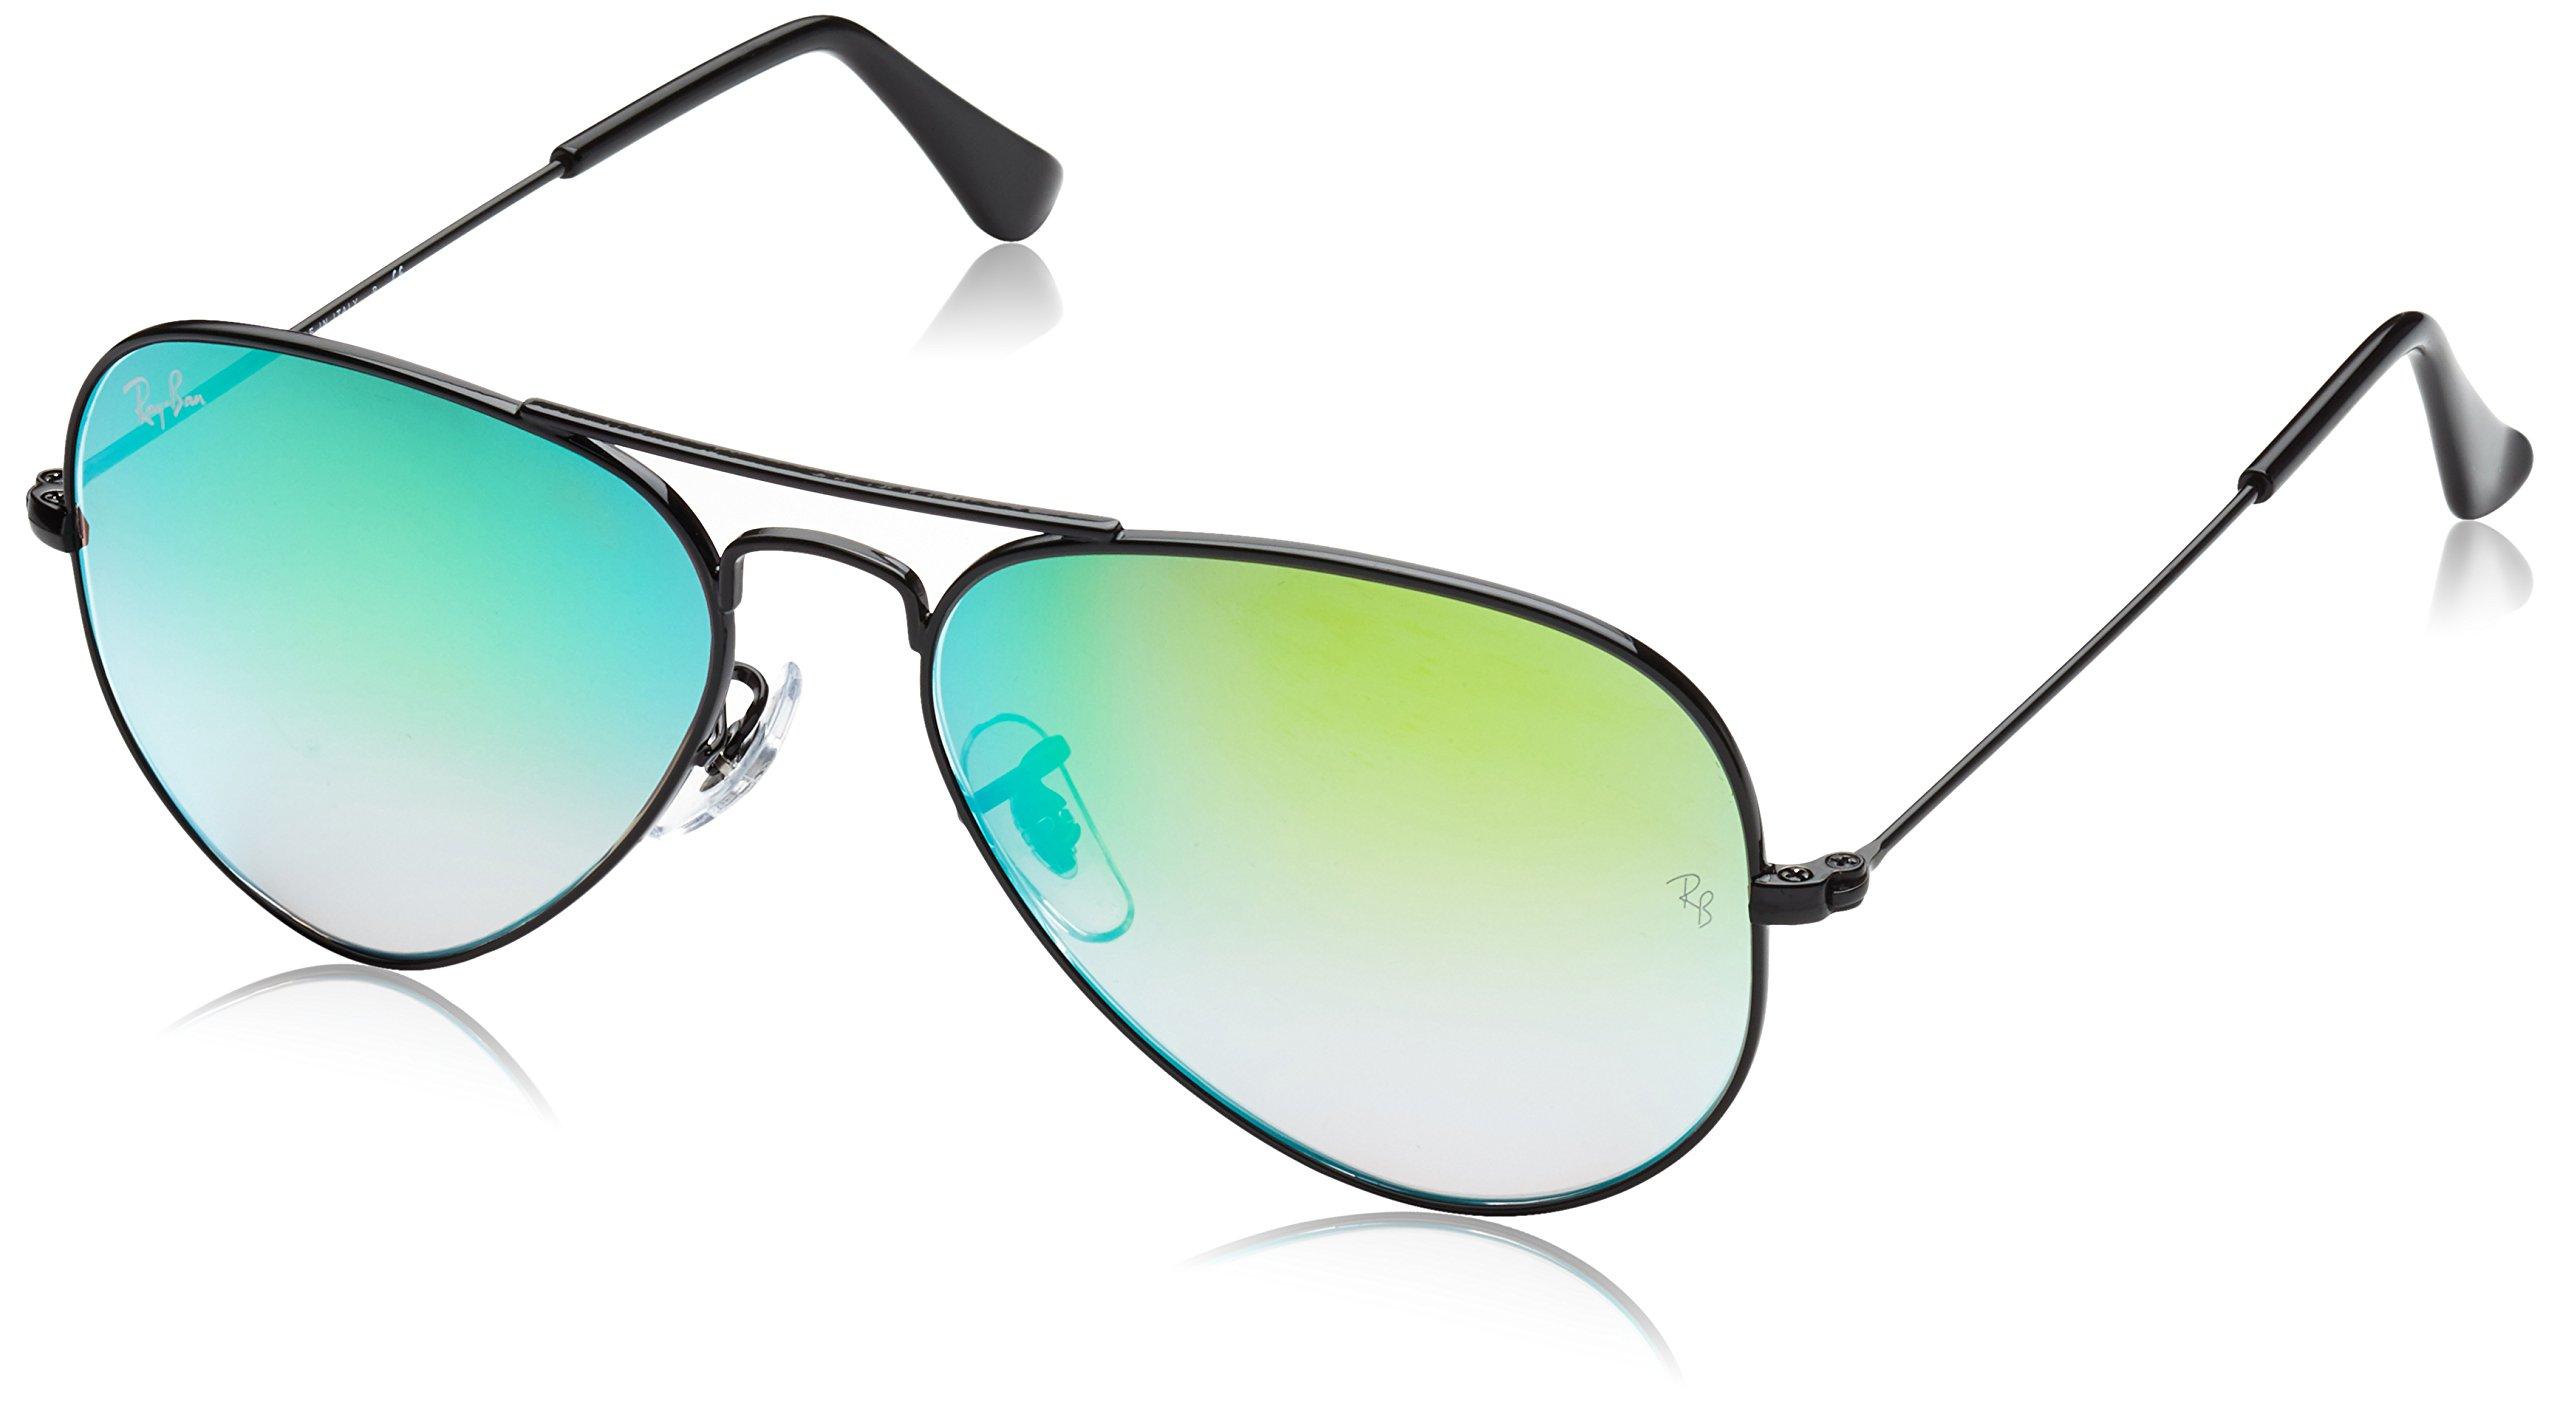 Ray-Ban 3025 Aviator Large Metal Mirrored Non-Polarized Sunglasses, Shiny Black/Mirror Gradient Green (002/4J), 55mm